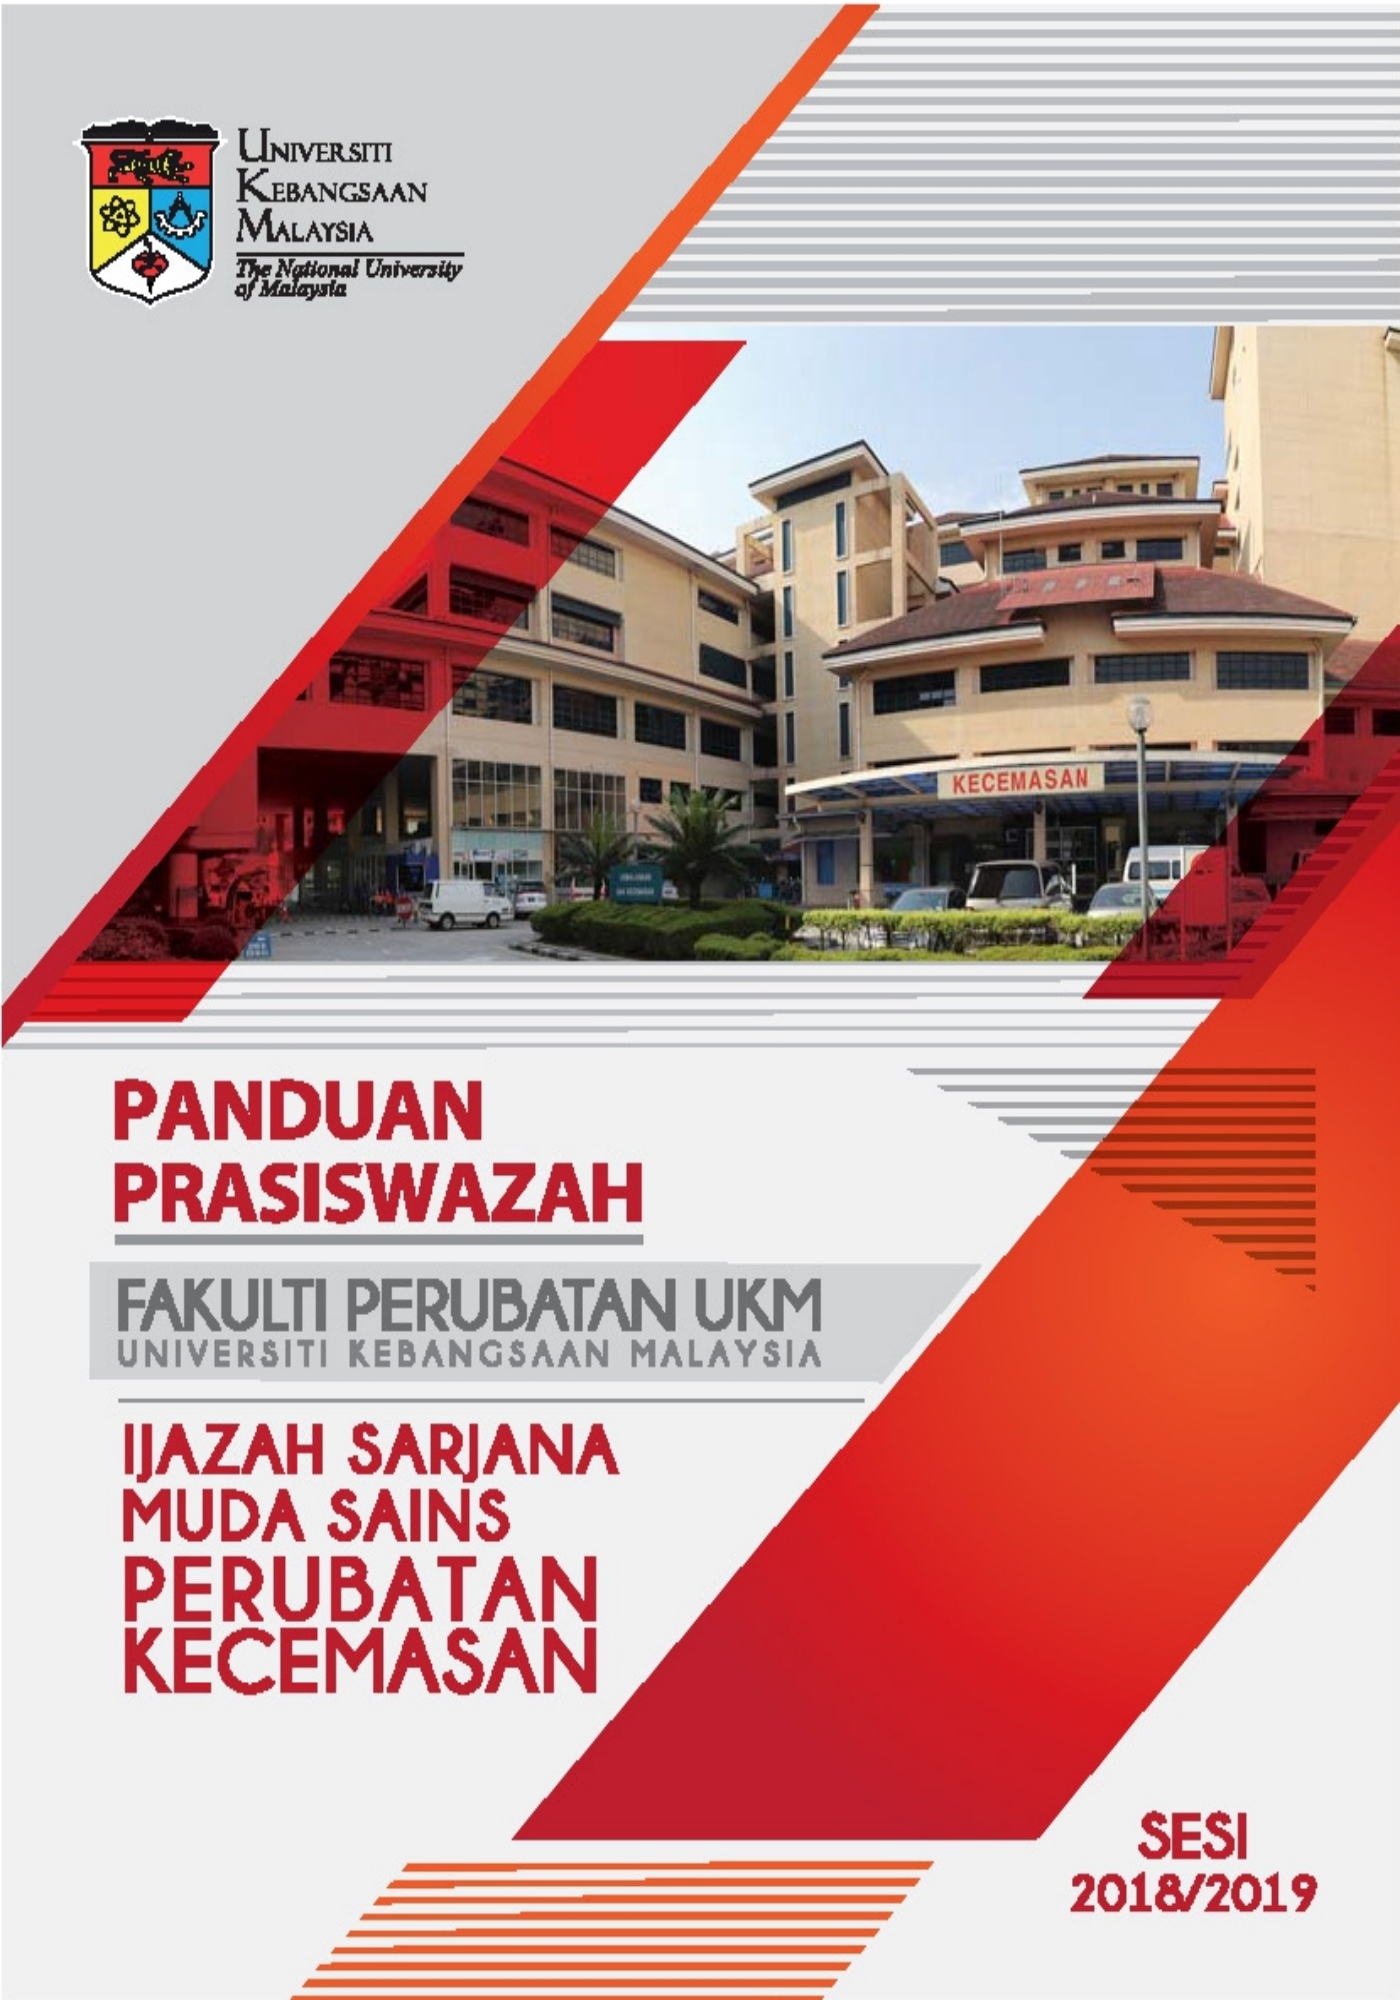 Panduan Prasiswazah - Ijazah Sarjana Muda Sains Perubatan Kecemasan - 2018:2019